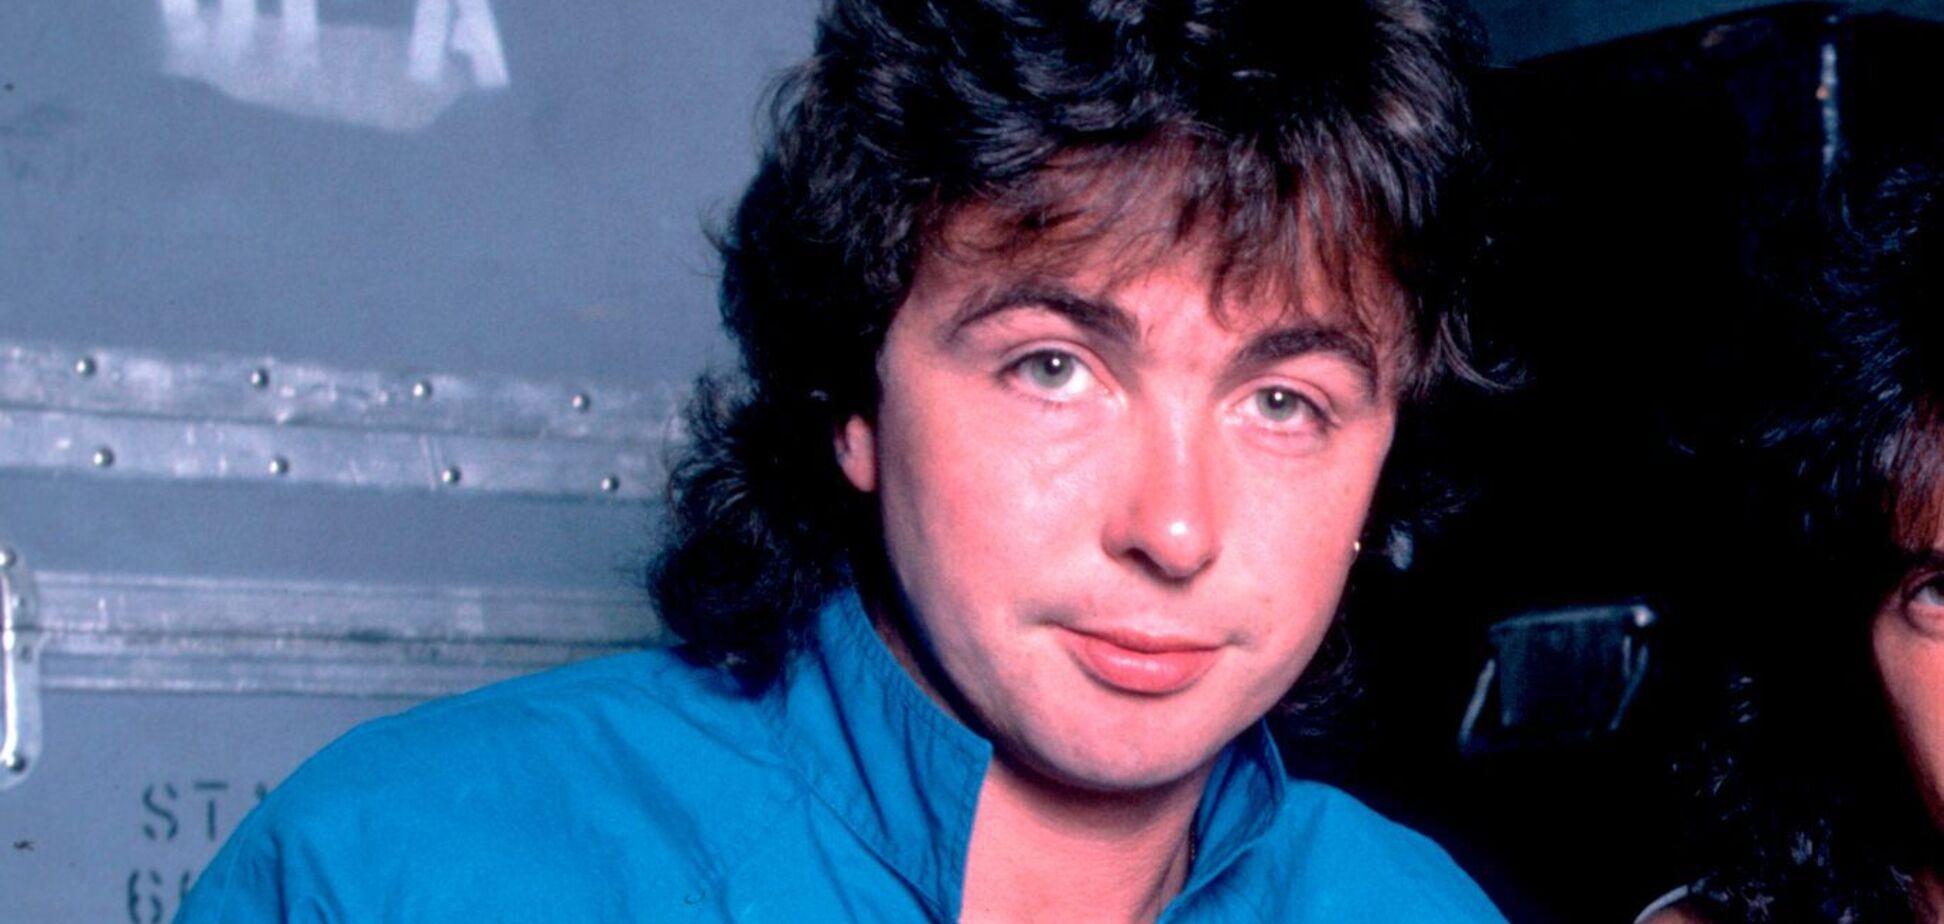 Умер солист рок-группы The Outfield Тони Льюис